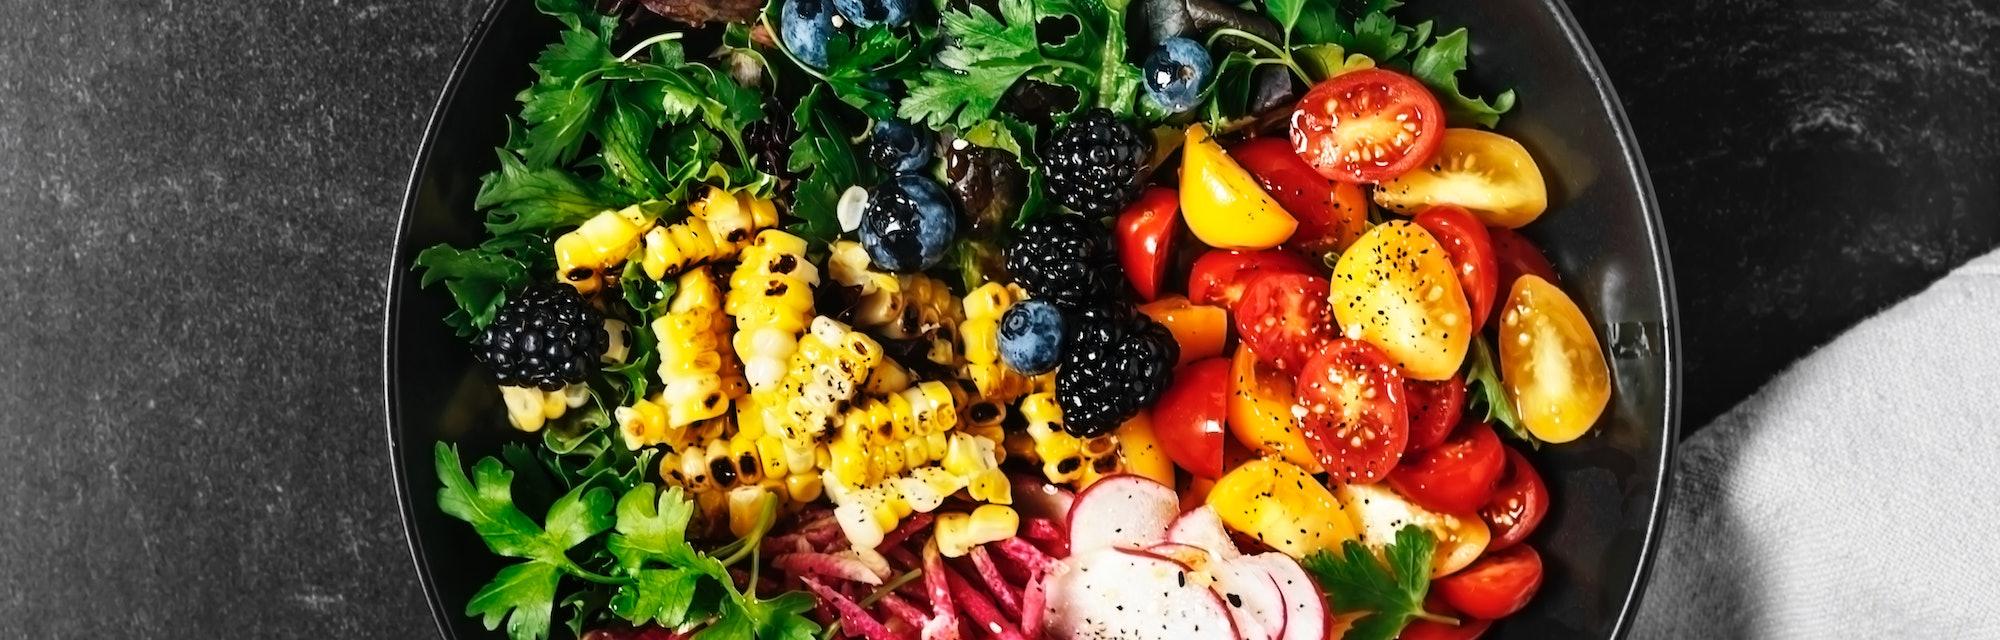 Bowl of fresh salad.